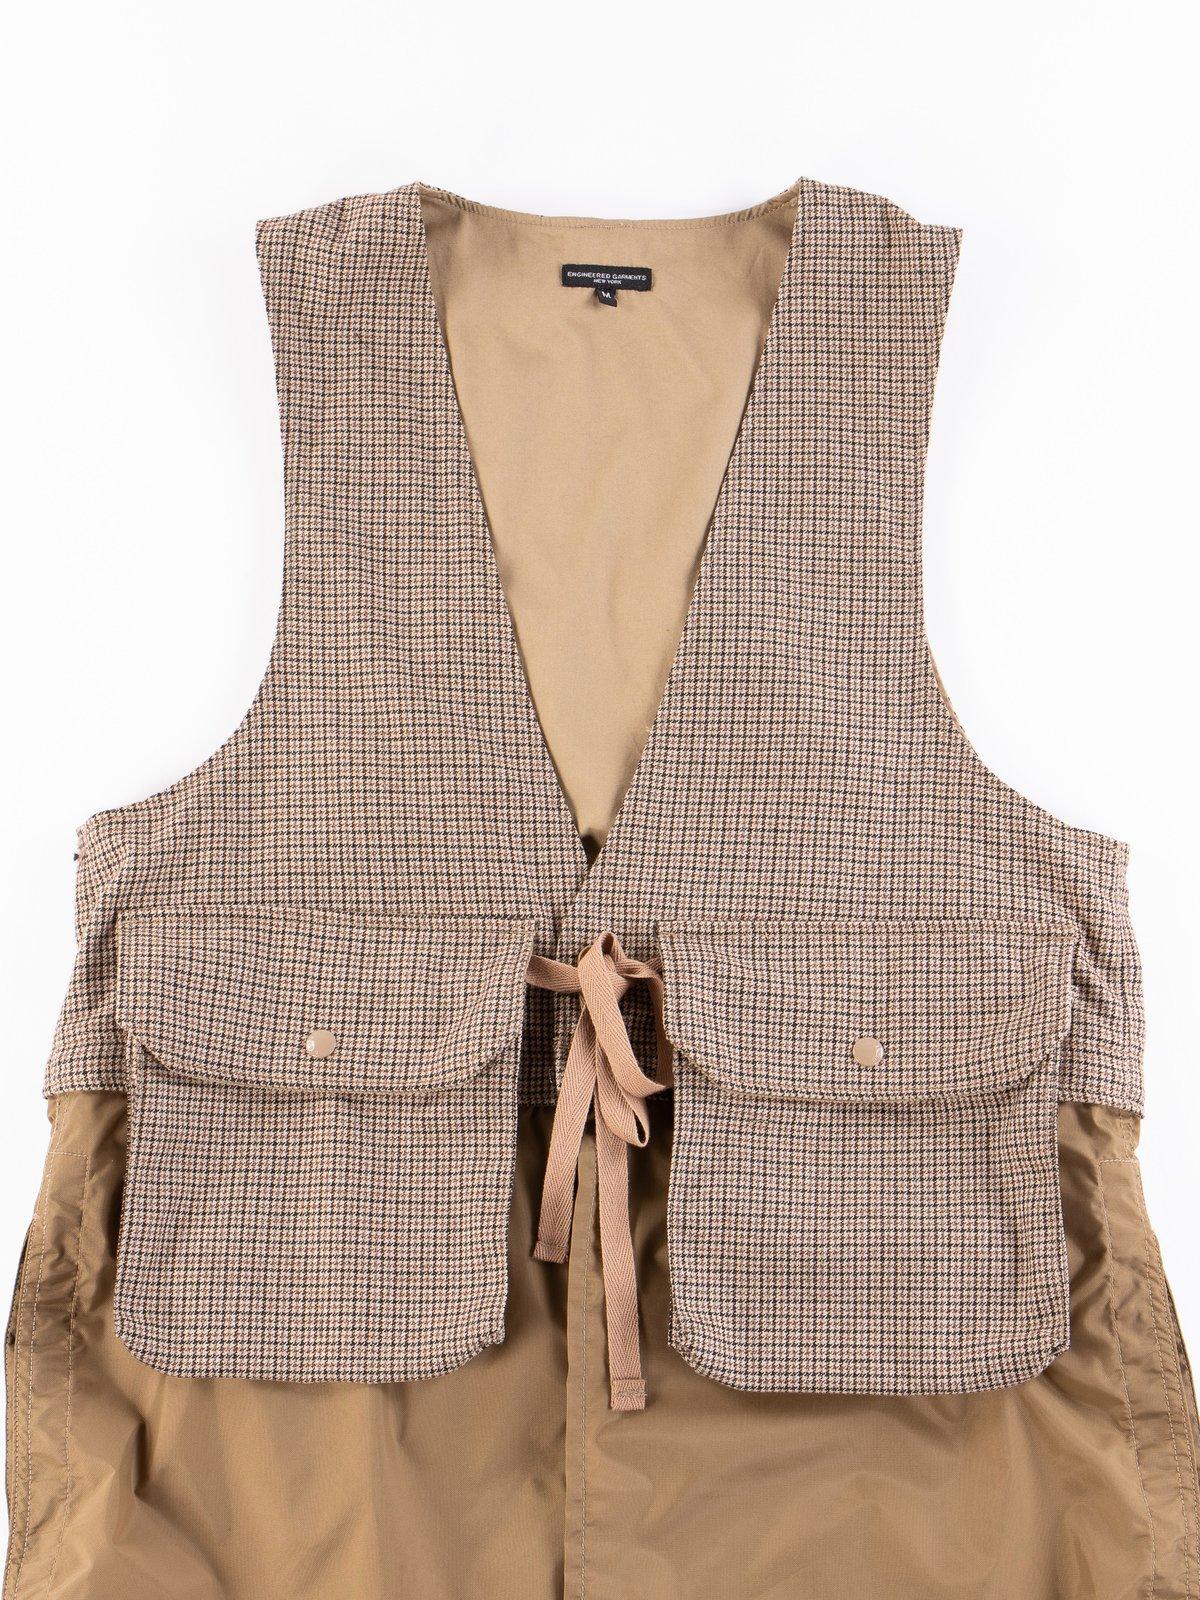 Brown Wool Poly Gunclub Check Long Fowl Vest - Image 3